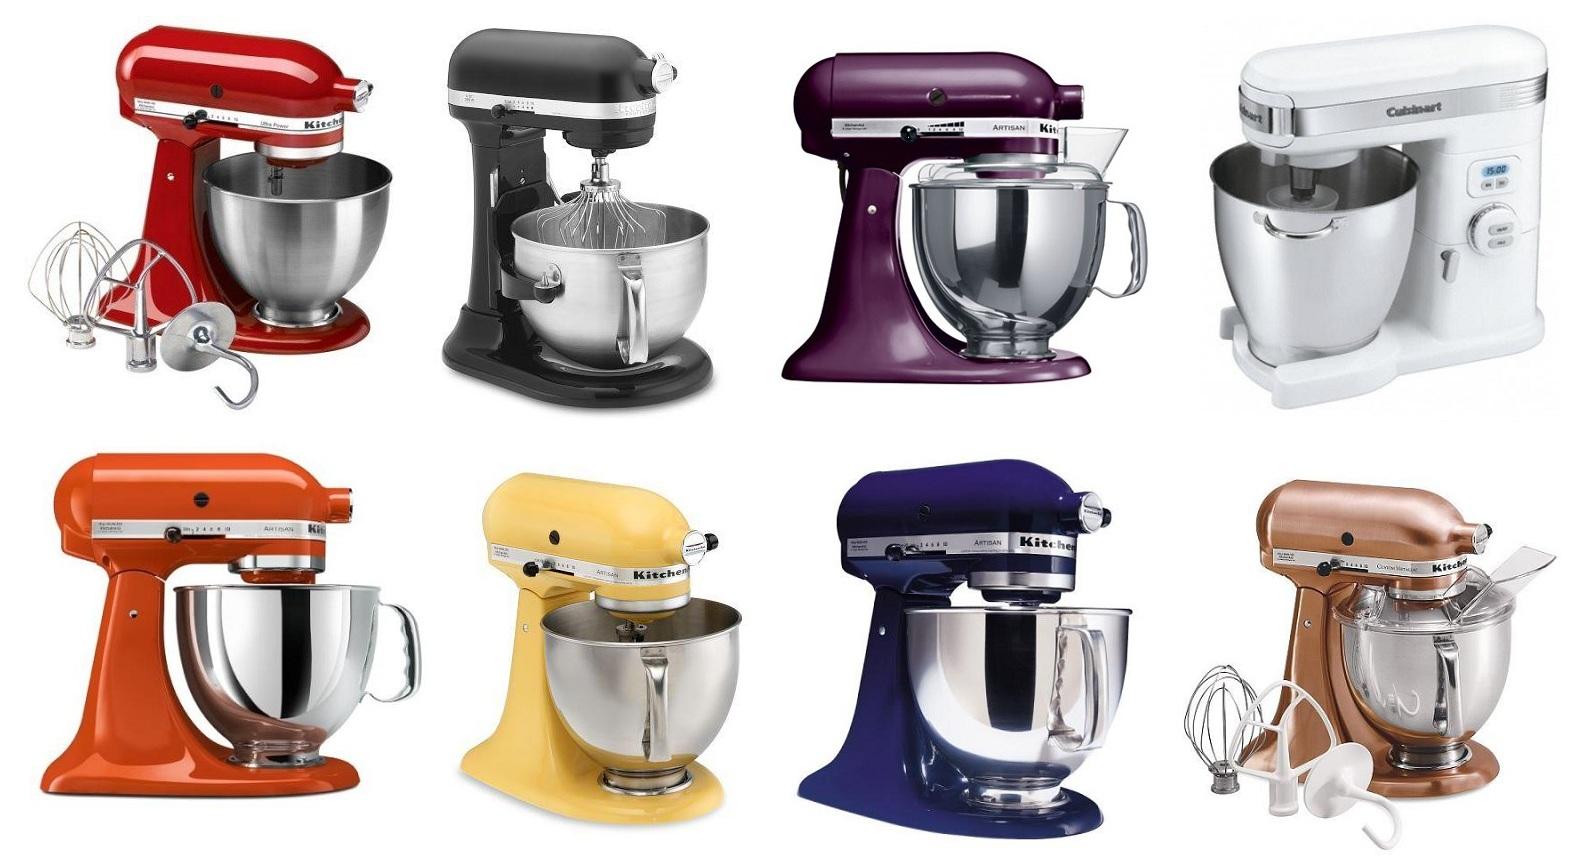 Kitchenaid mixer and attachments | | Kitchen ideas